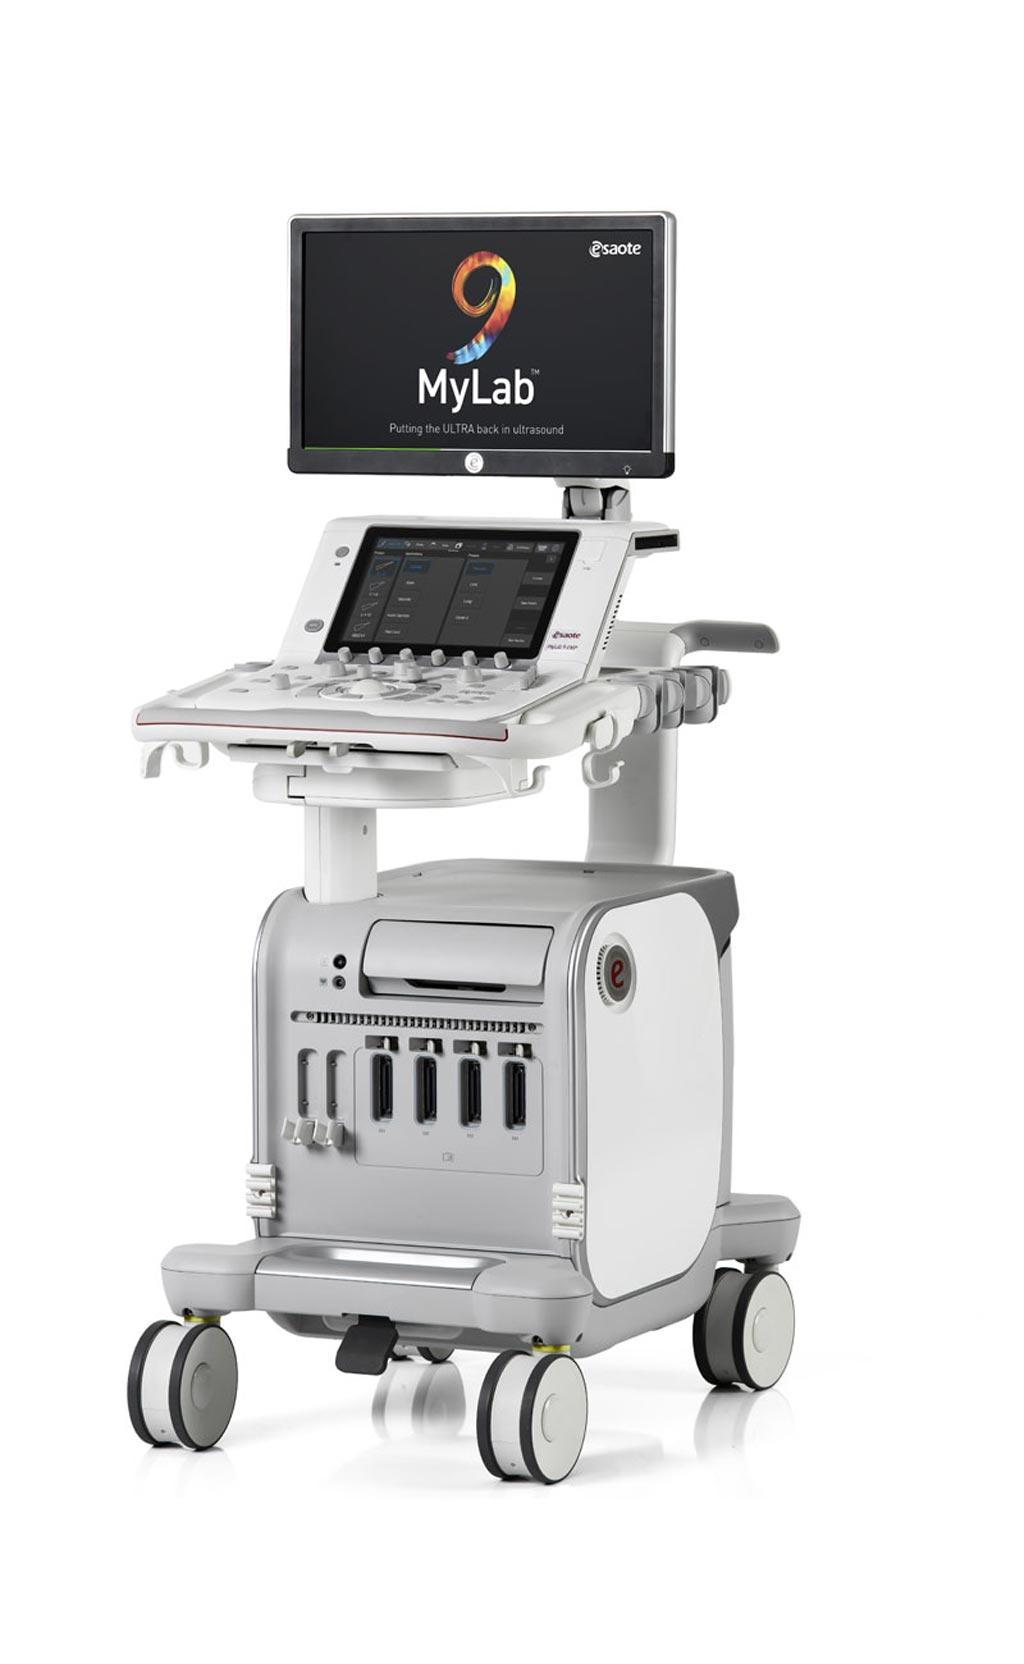 Image: The MyLab 9 eXP ultrasound system (Photo courtesy of Esaote).